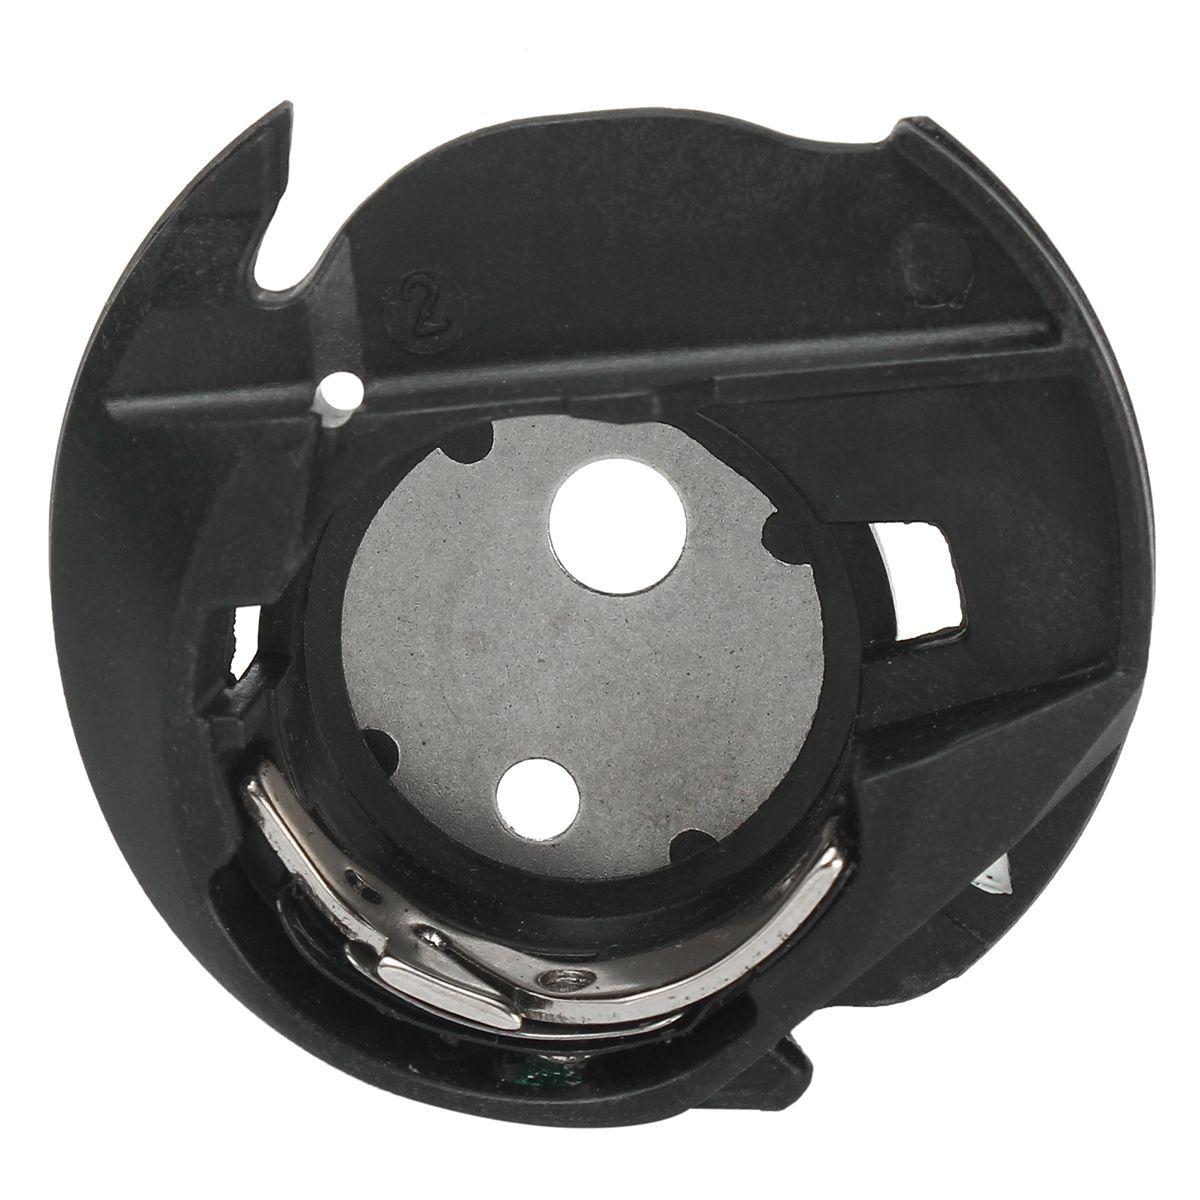 Bobbin Case Sewing Machine Parts For Singer Q6a0764000 3323 4411